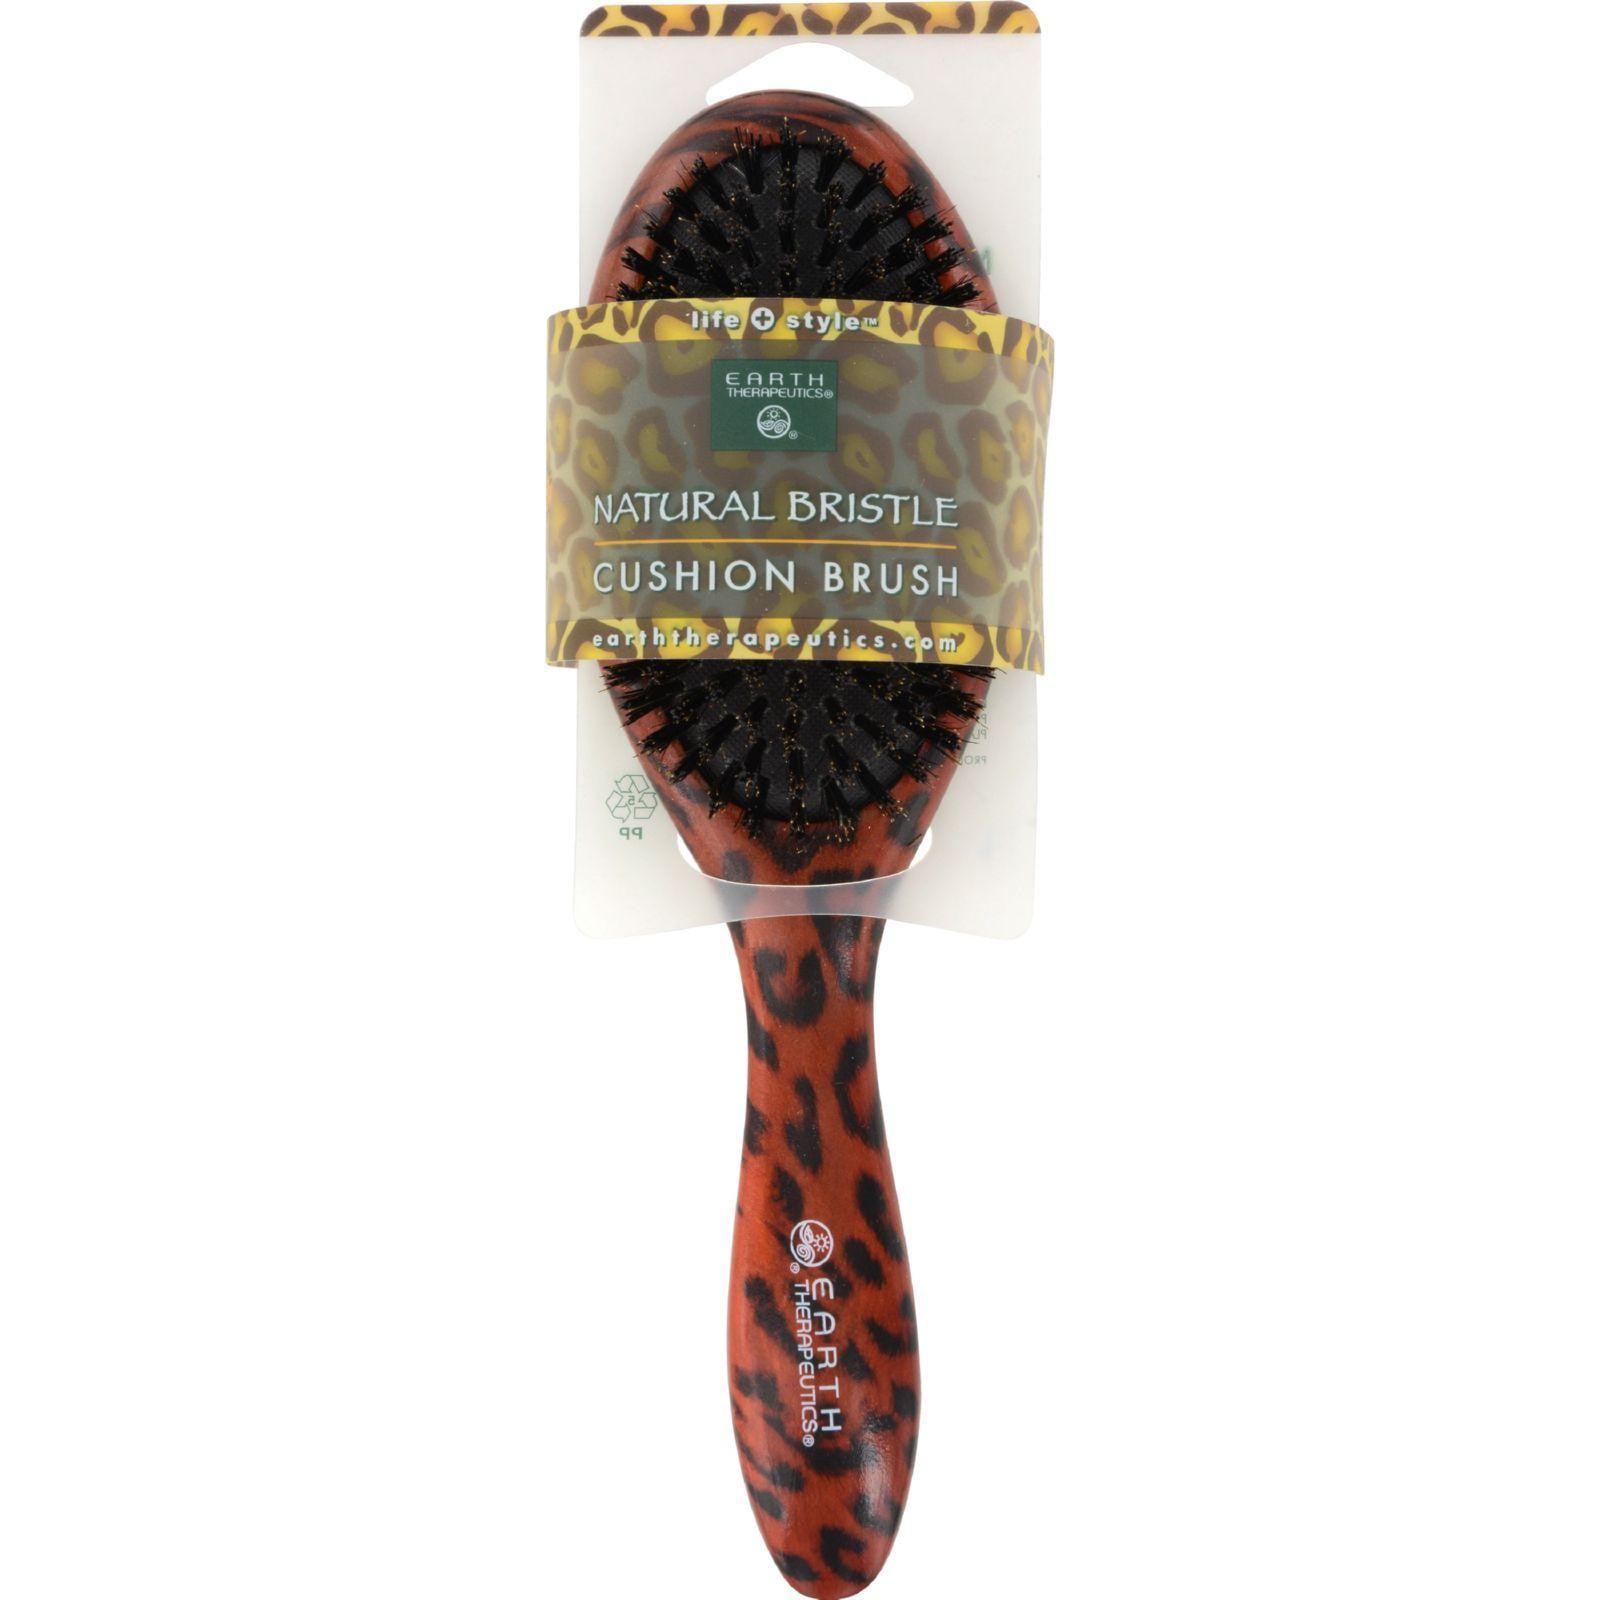 Earth Therapeutics Regular Natural Bristle Cushion Brush With Leopard Design - 1 Brush